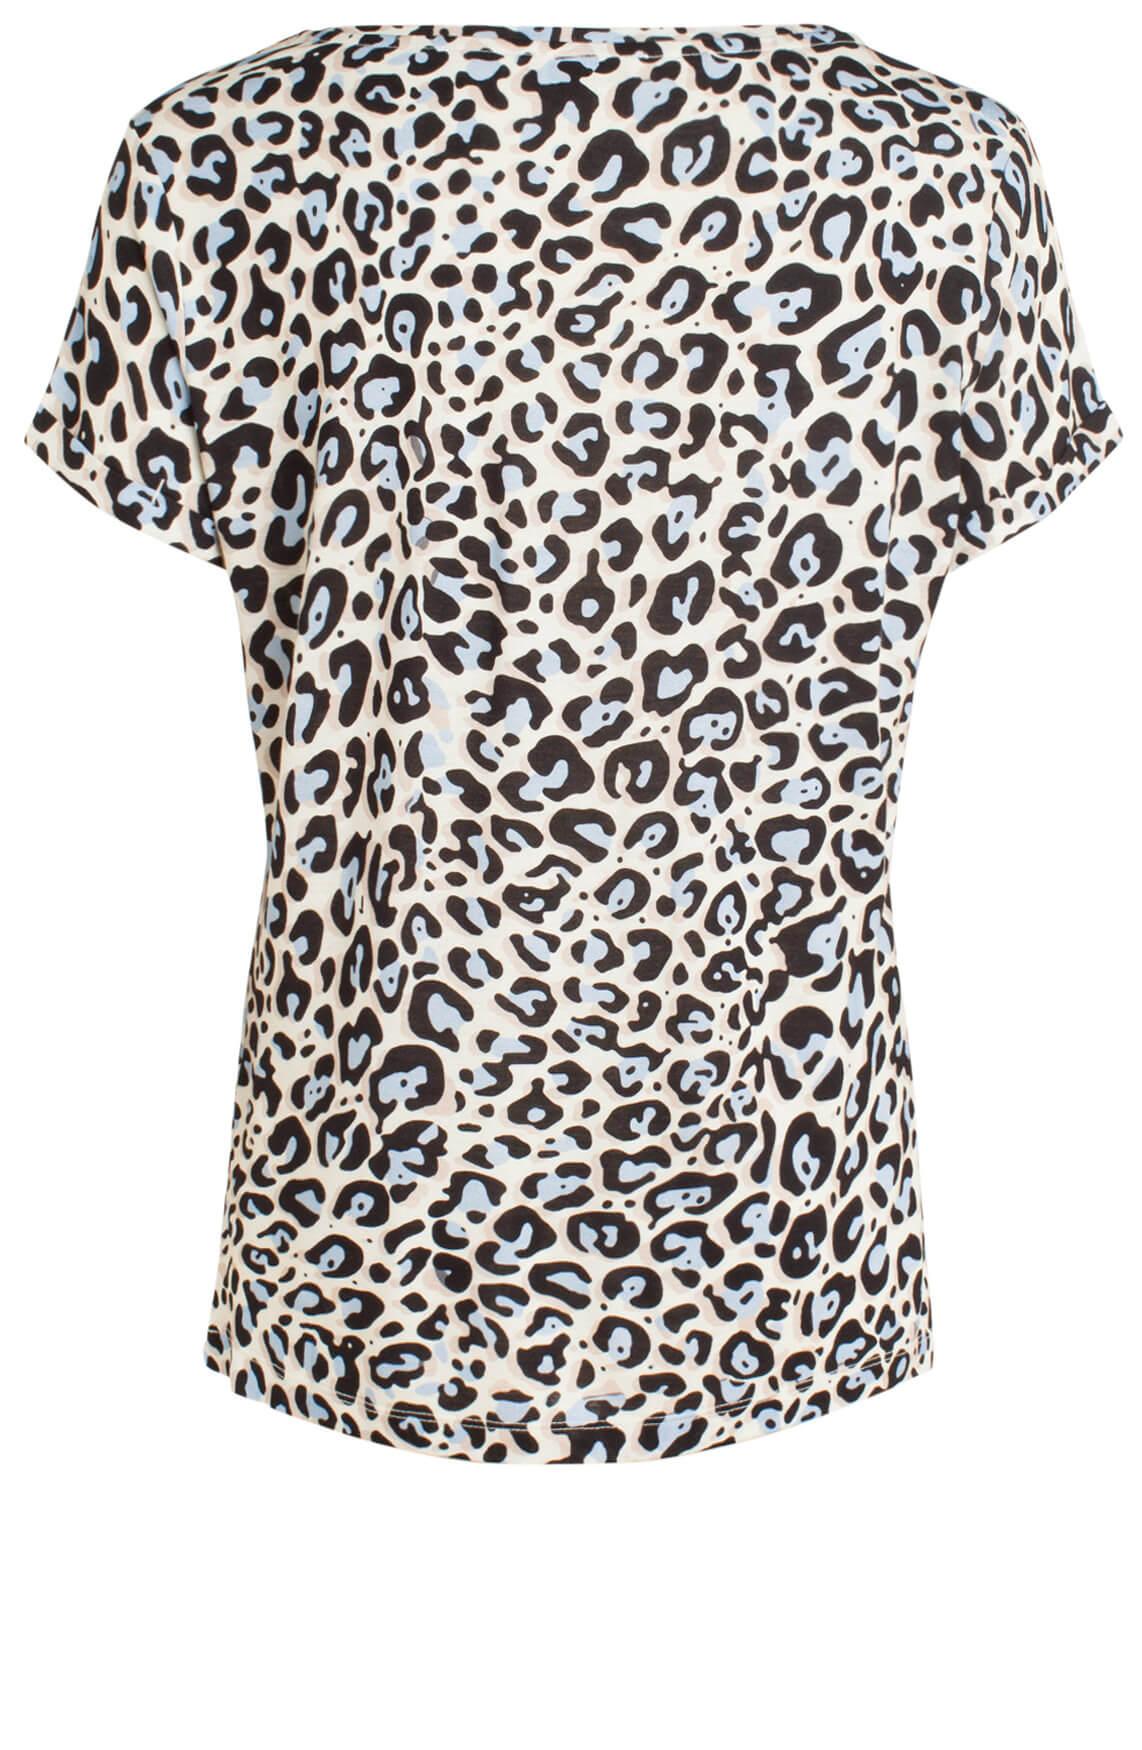 Anna Dames Shirt met panterprint Ecru